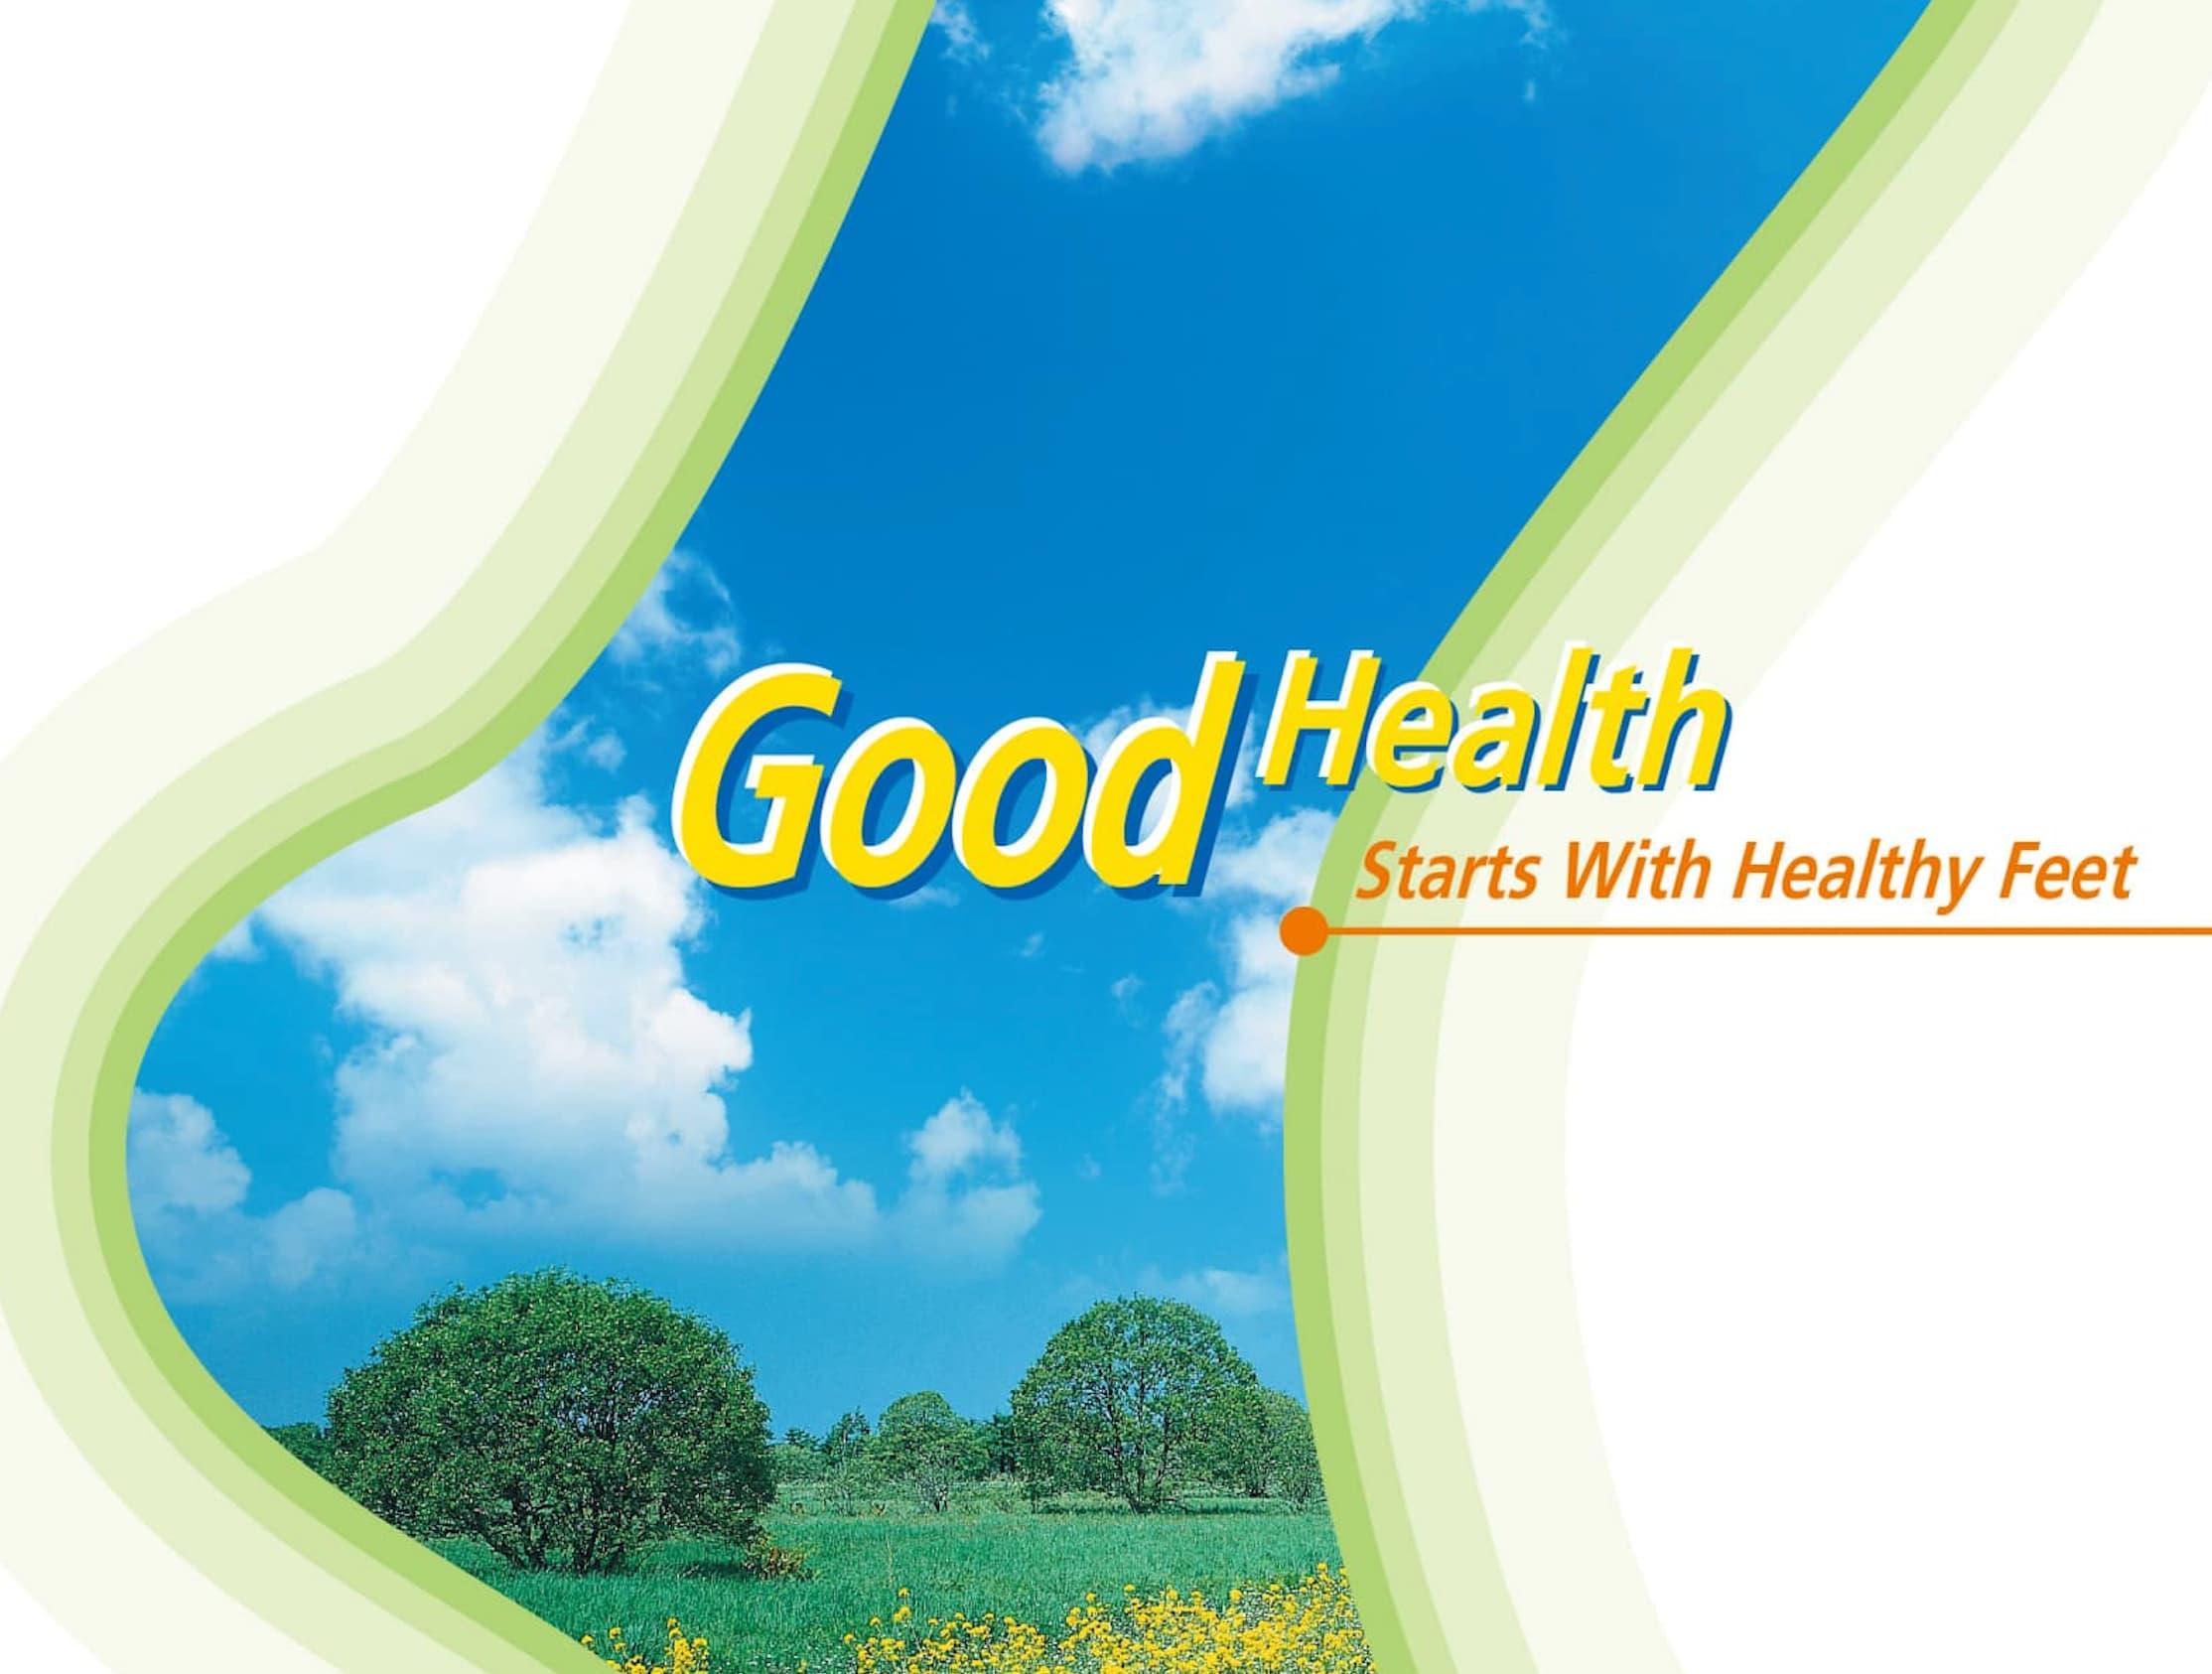 Good Health Starts With Healthy Feet